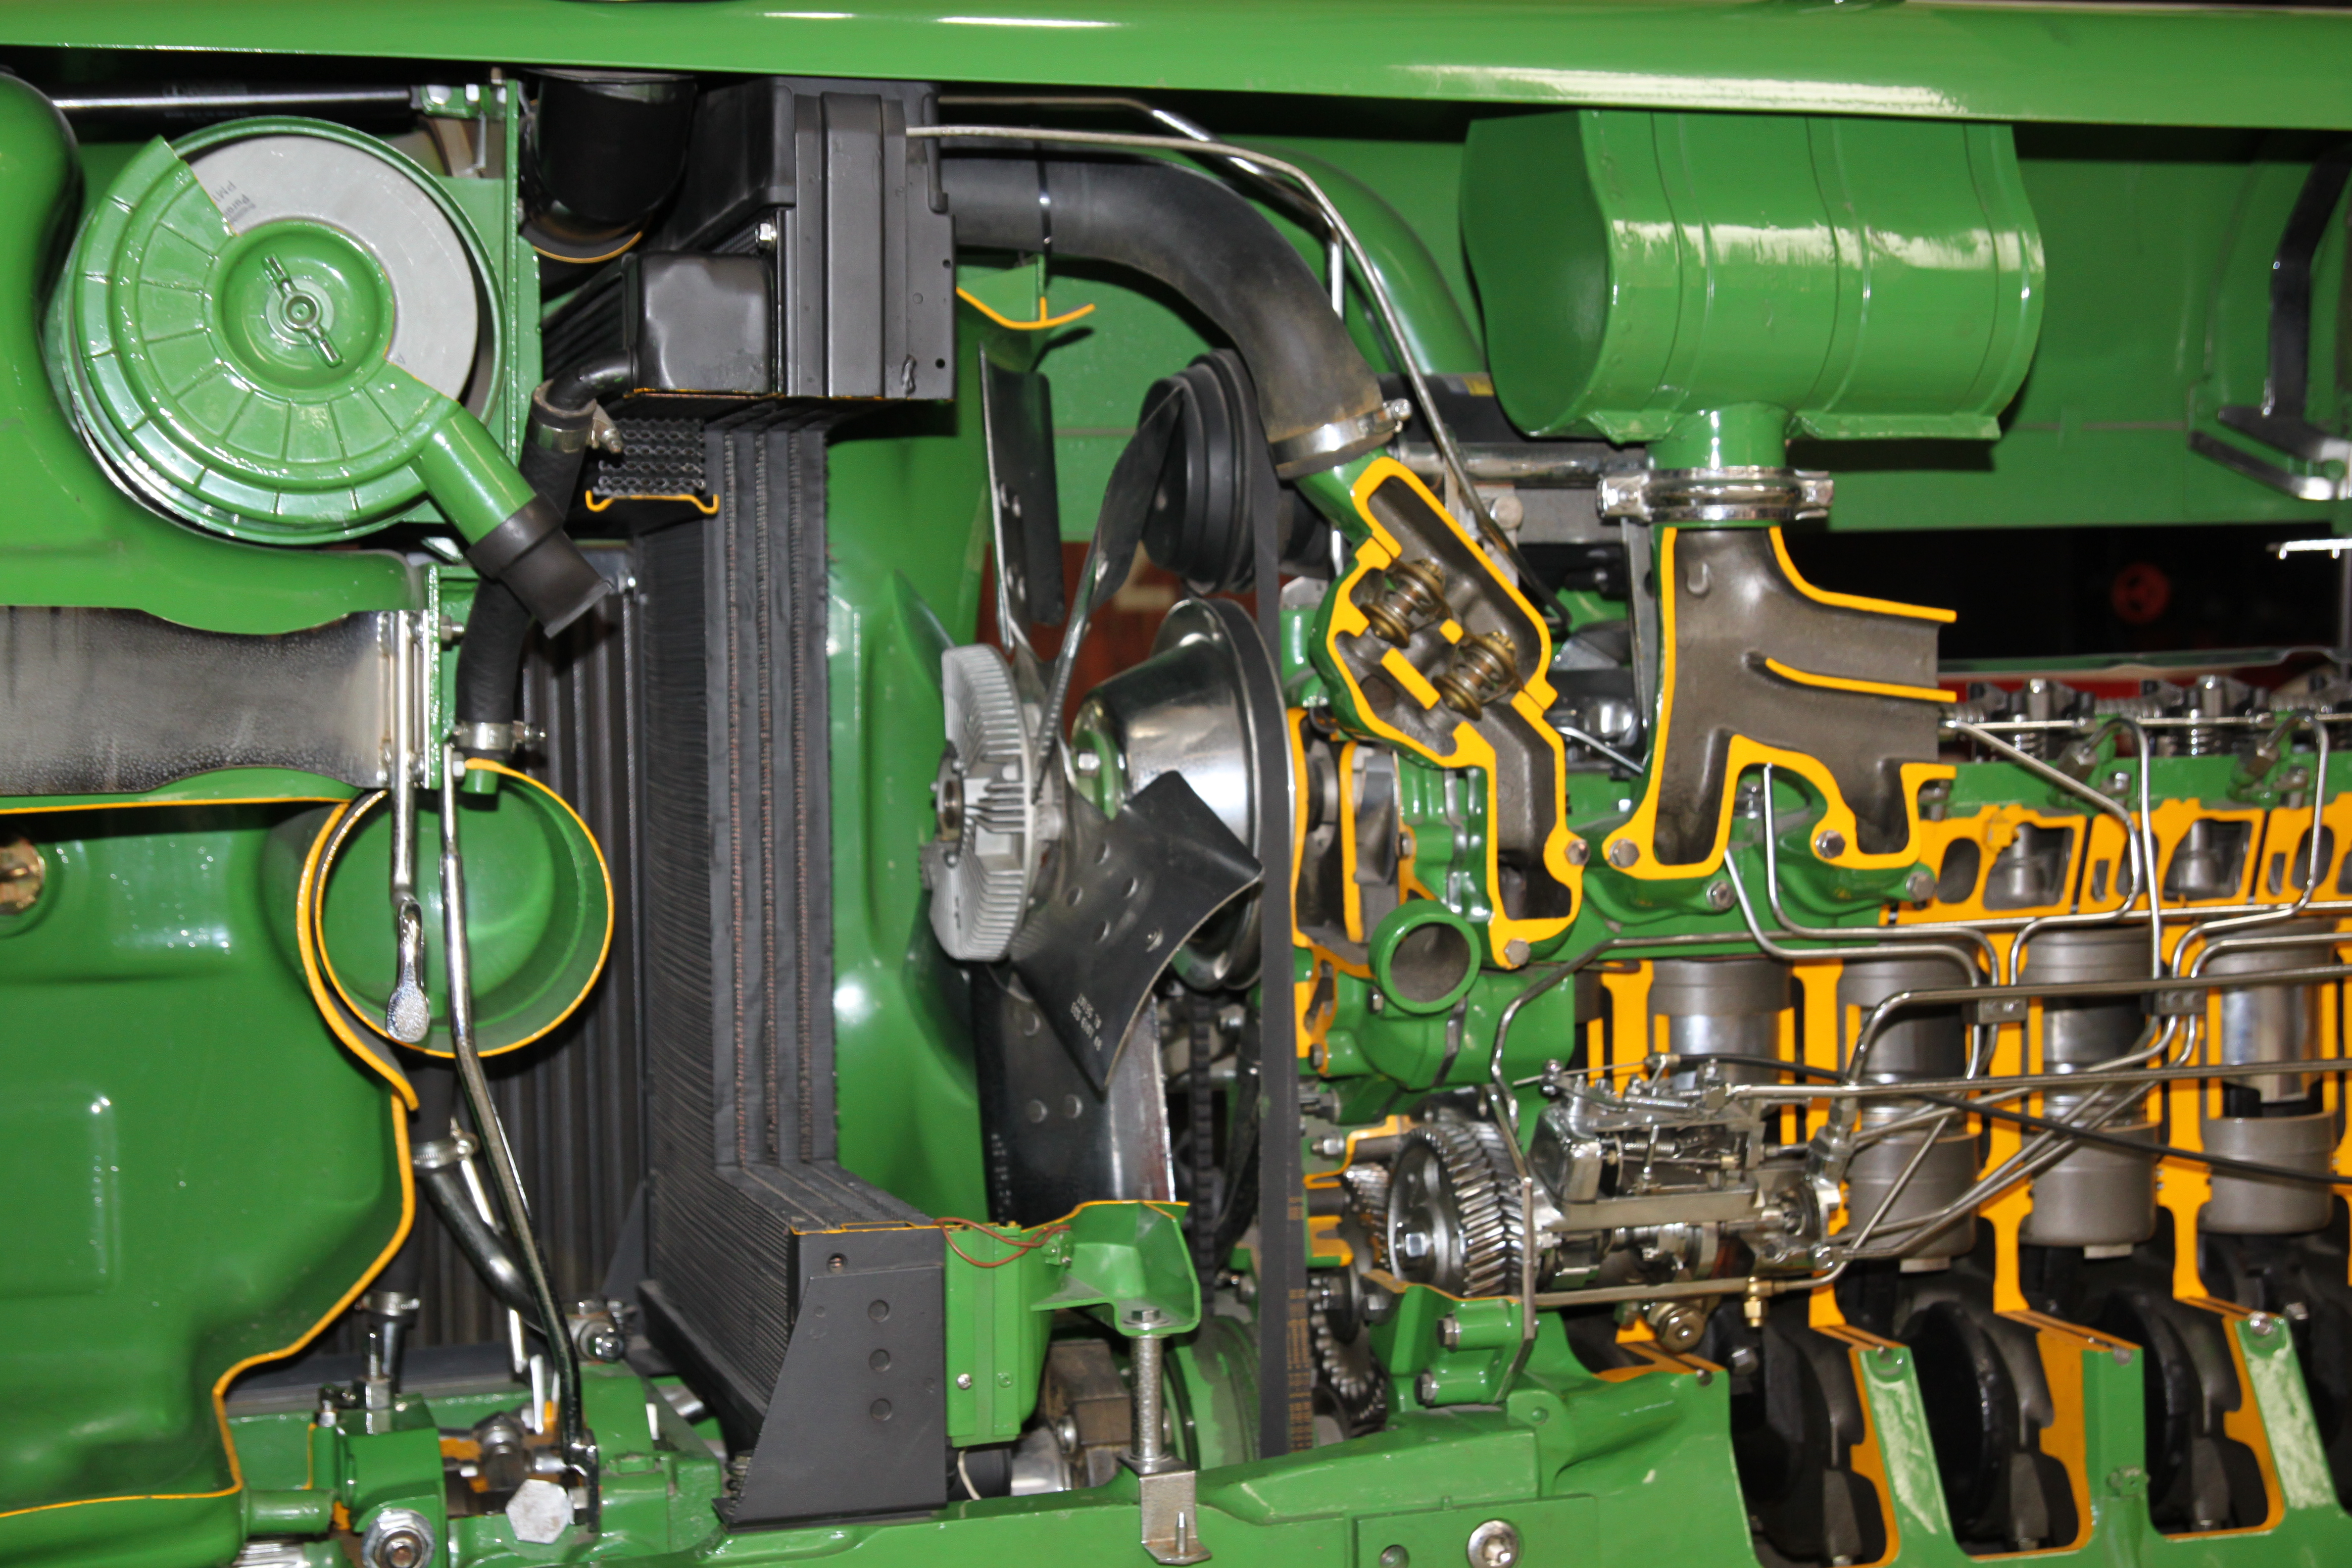 Tractor Transmission System : File john deere schnittmodell kühlung g wikimedia